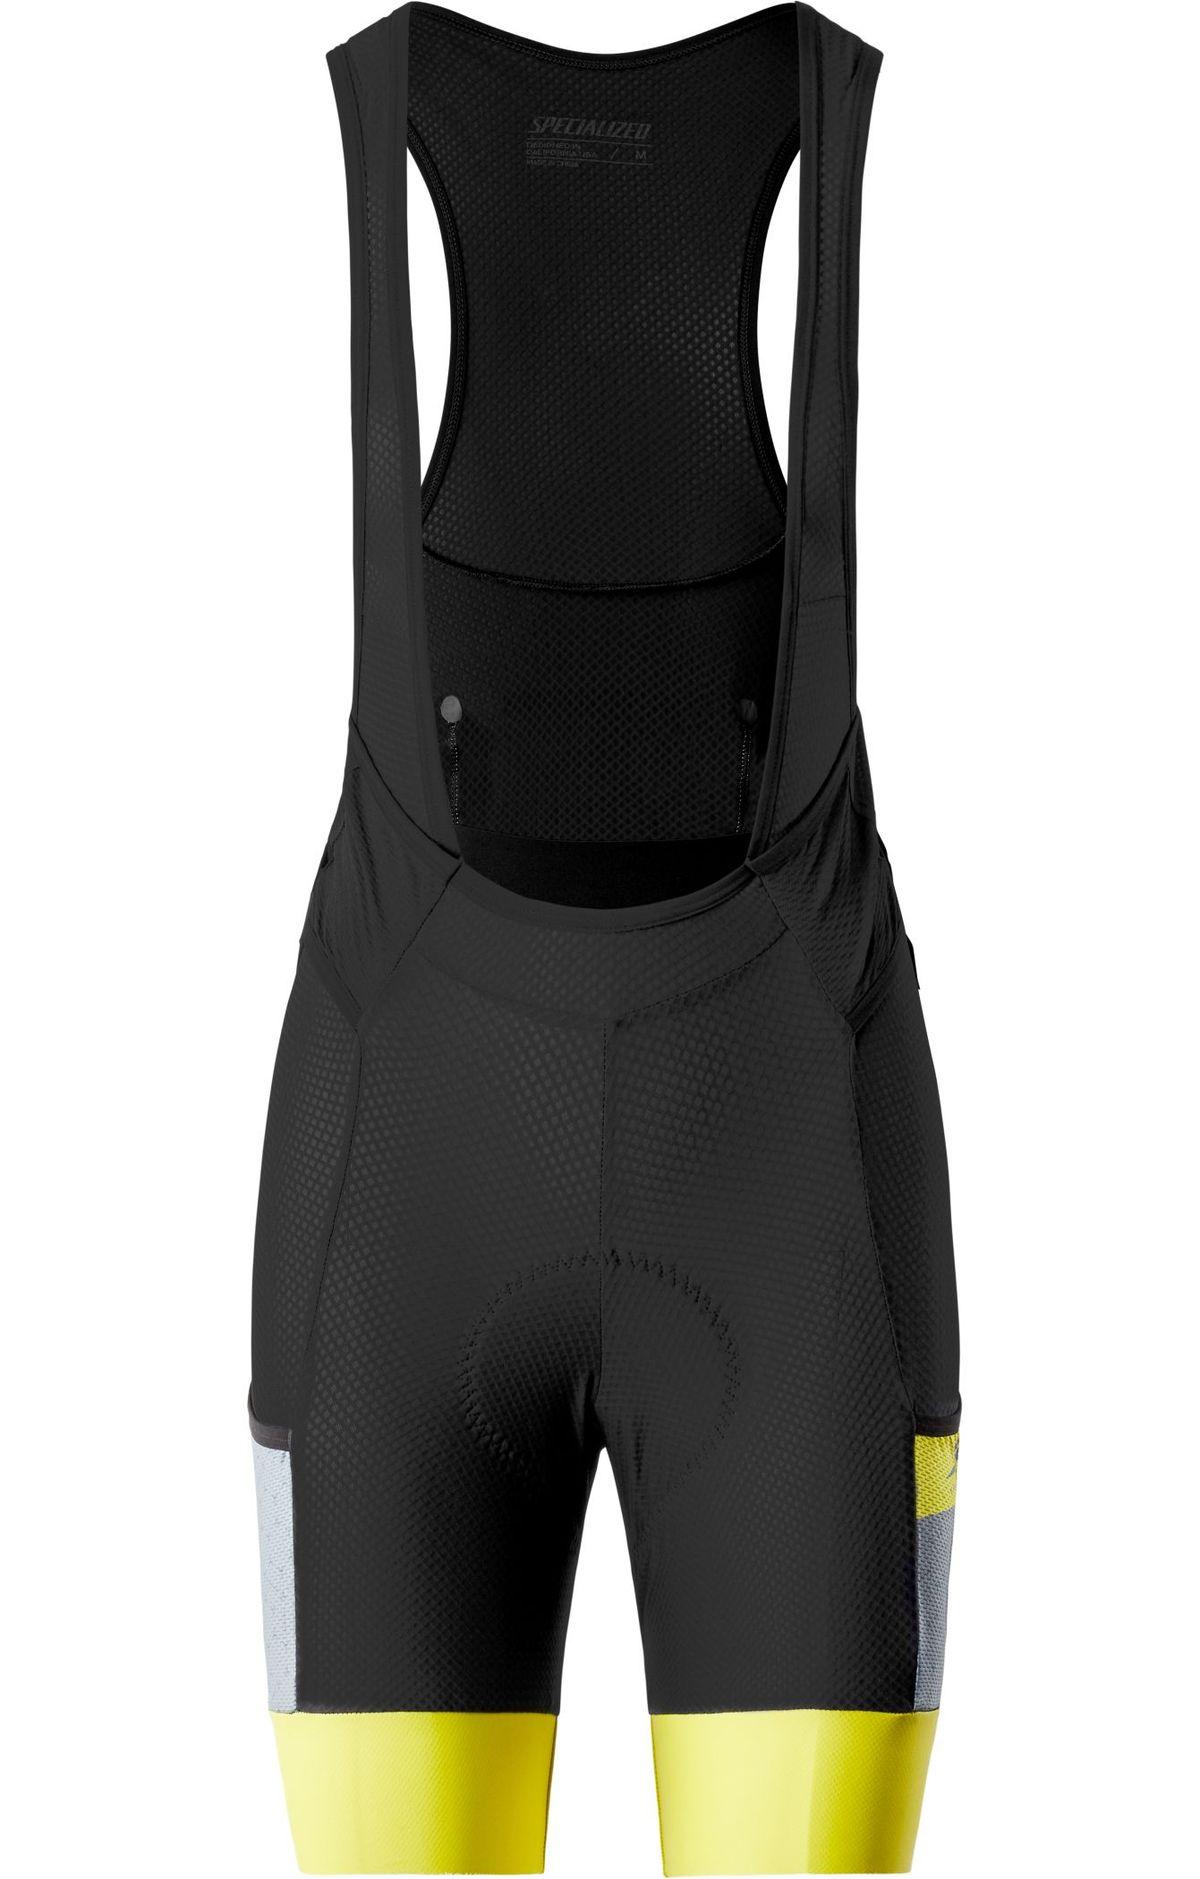 2020 Men/'s Road Bike Cycling Jersey Short Sleeve Bib Shorts Kits Biking Clothing